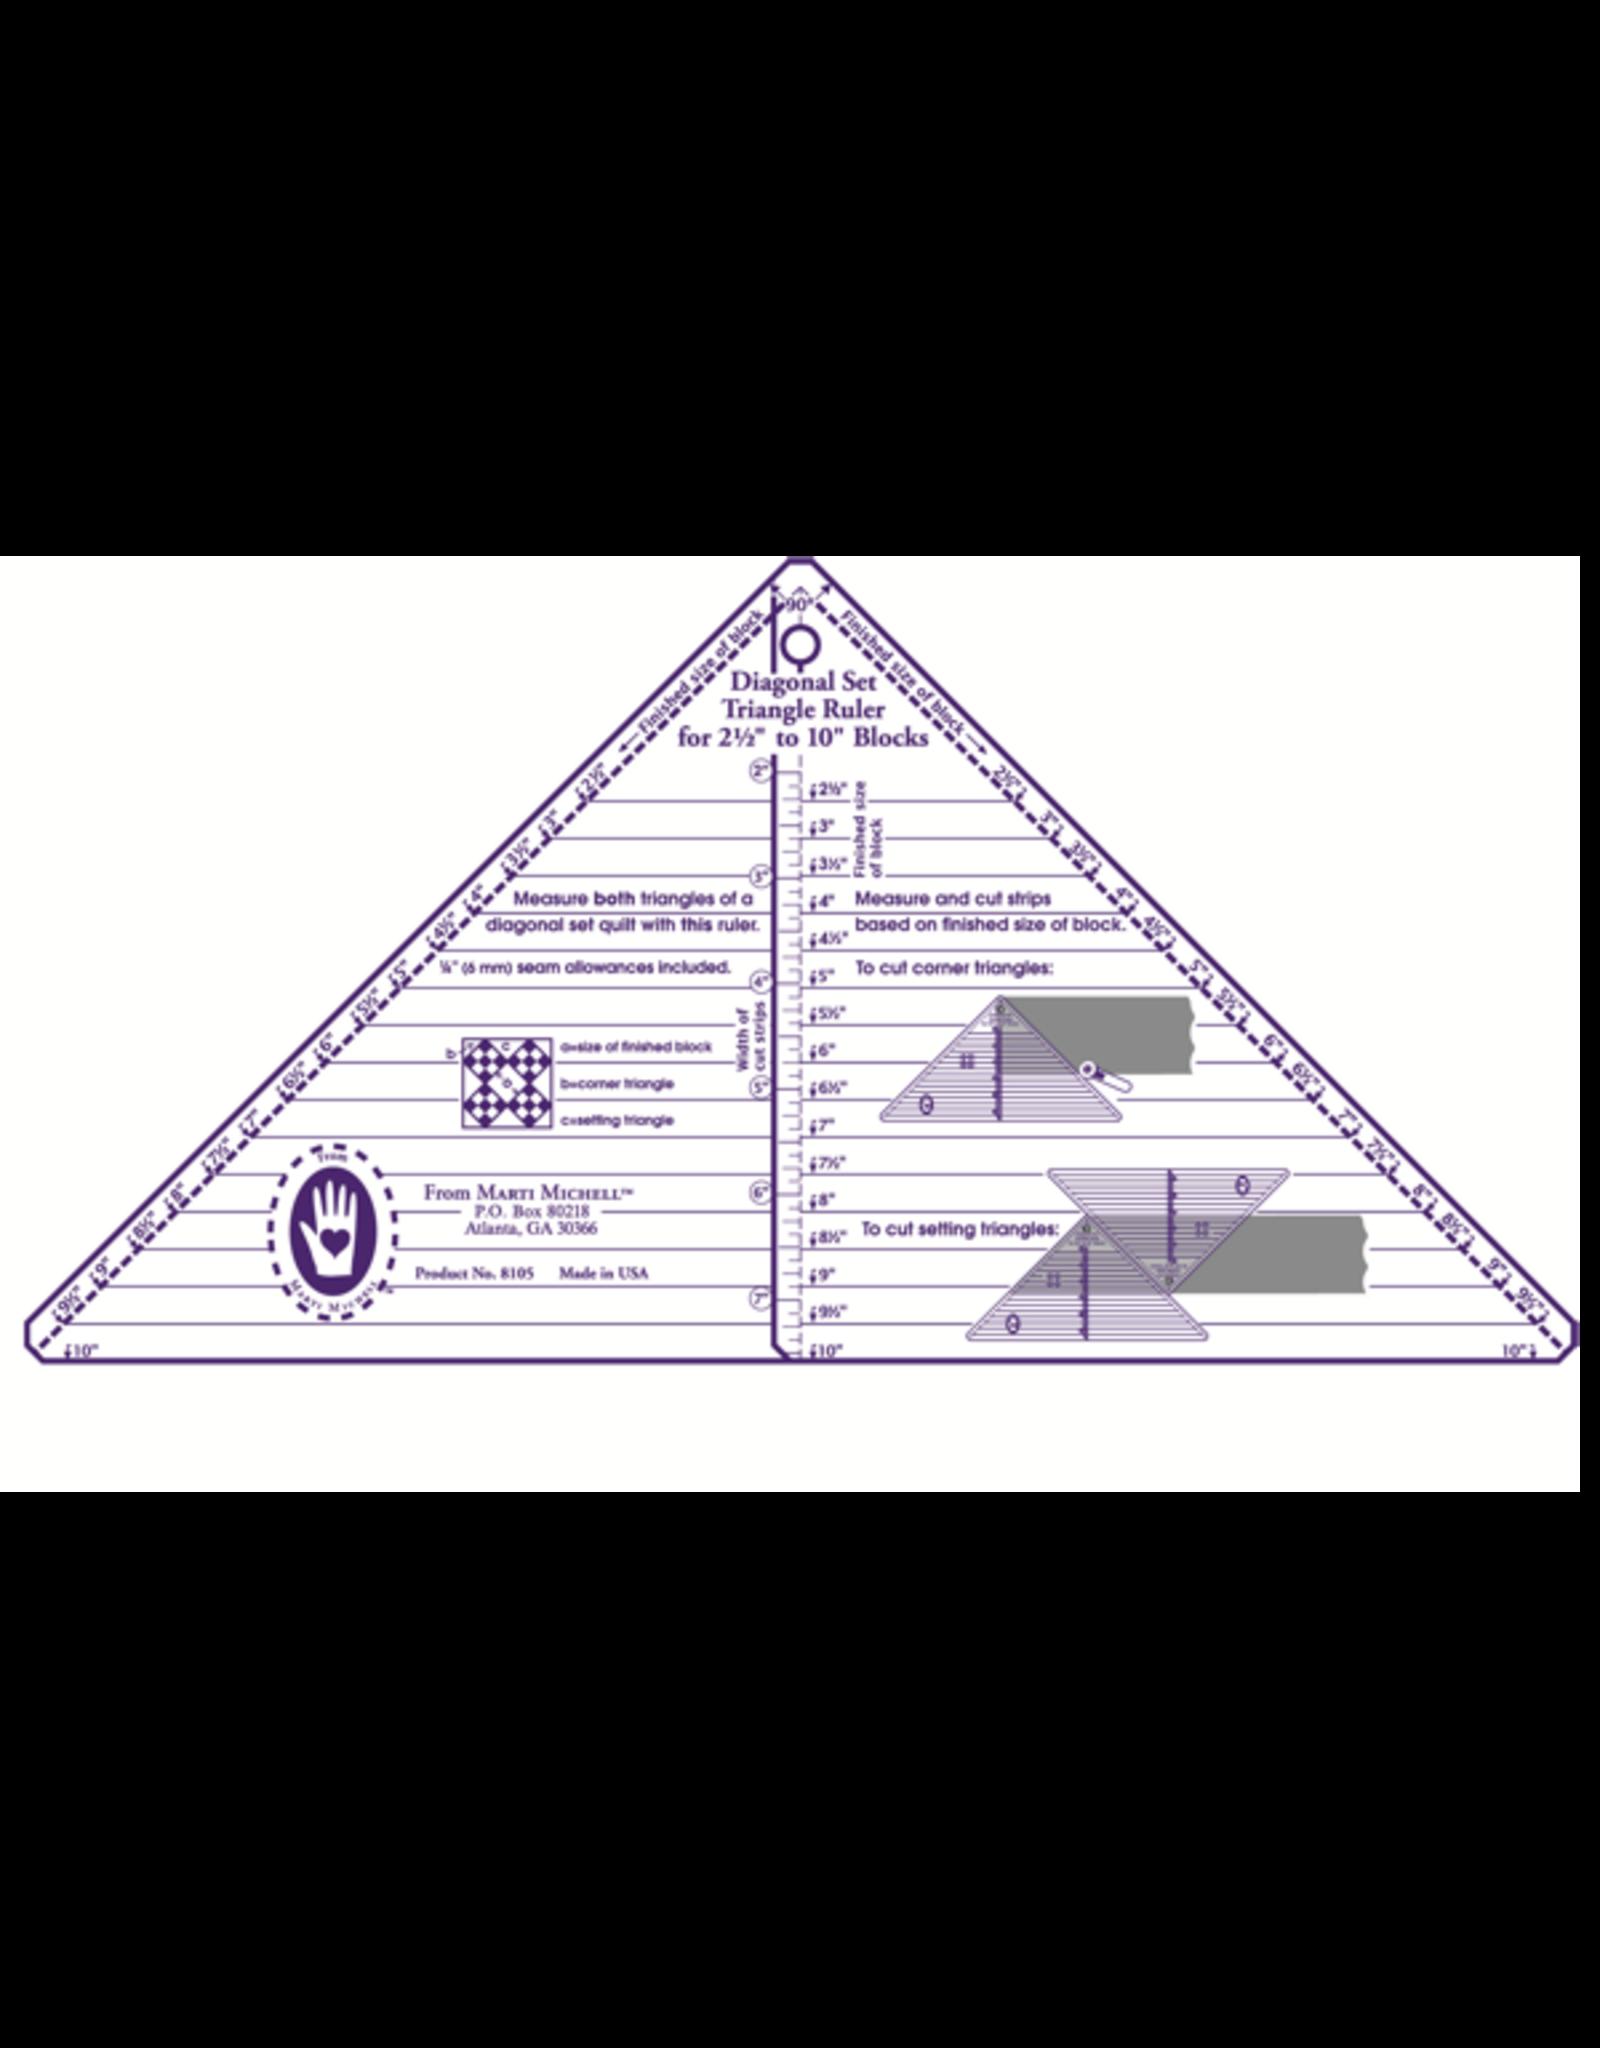 Diagonal Set Full Triangle Ruler - 2,5-10 inch blocks